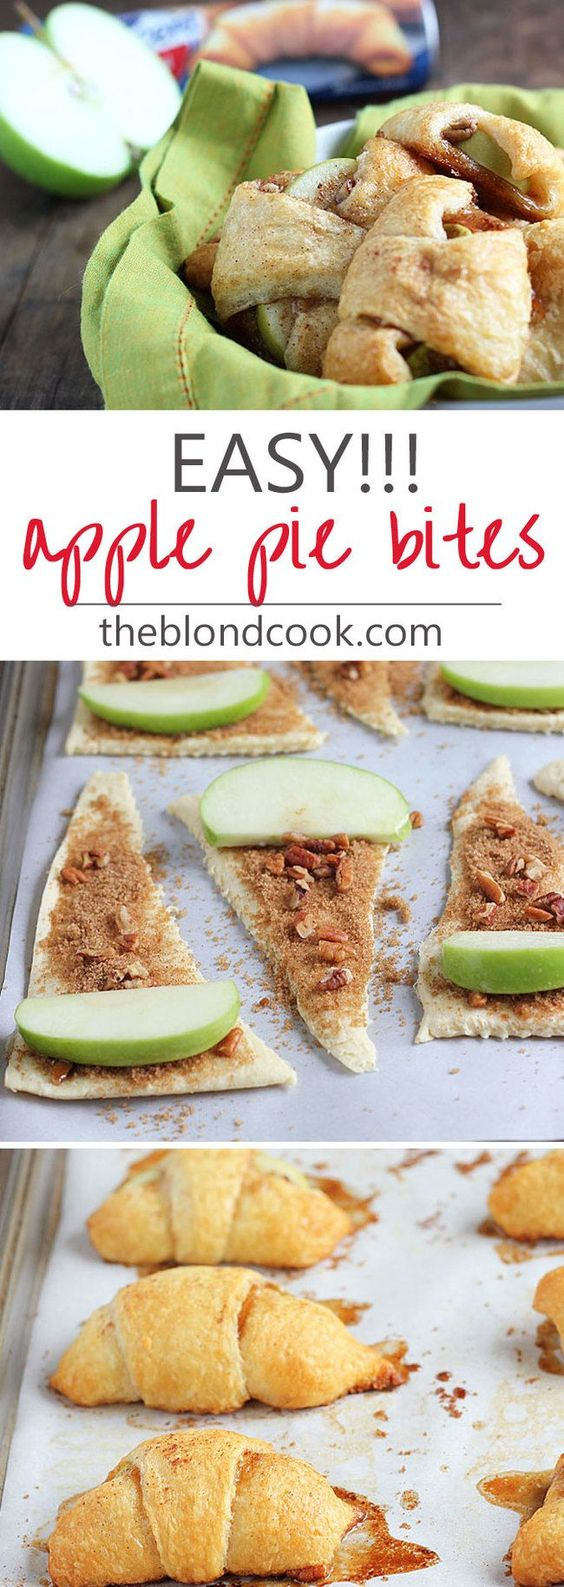 APPLE PIE BITES #apple #pie #bites #cake #cakerecipes #dessert #dessertrecipes #cookie #cookierecipes